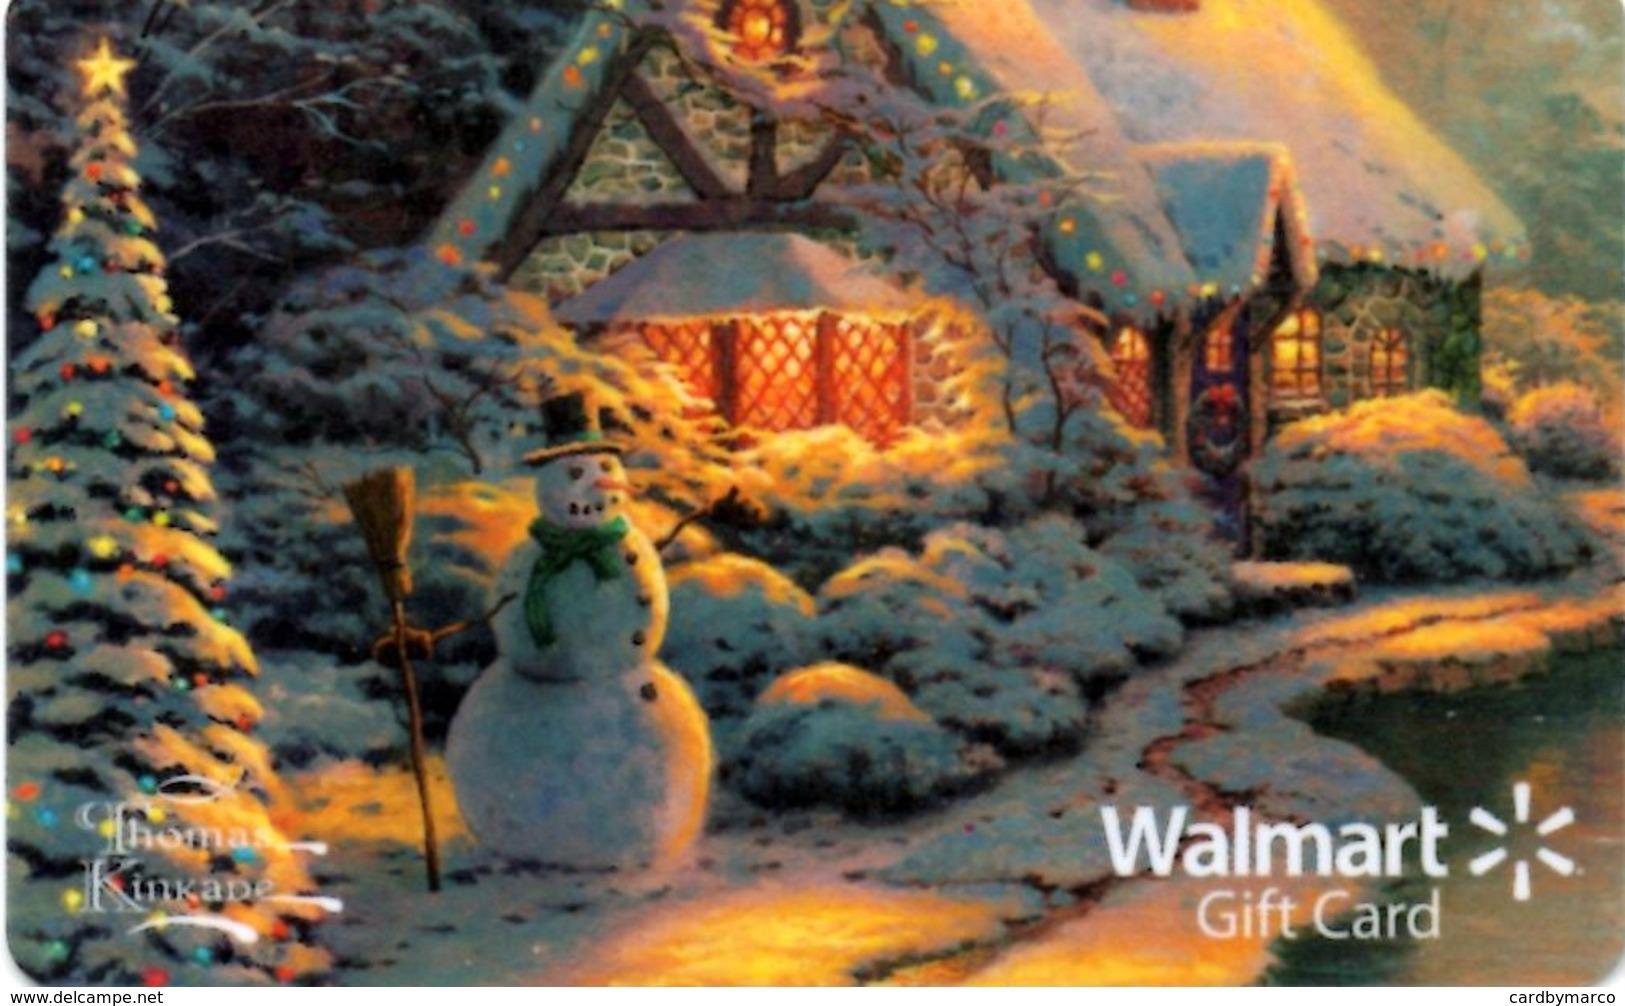 *U.S.A. - NATALE* -  GIFT CardNUOVA (MINT) - Natale